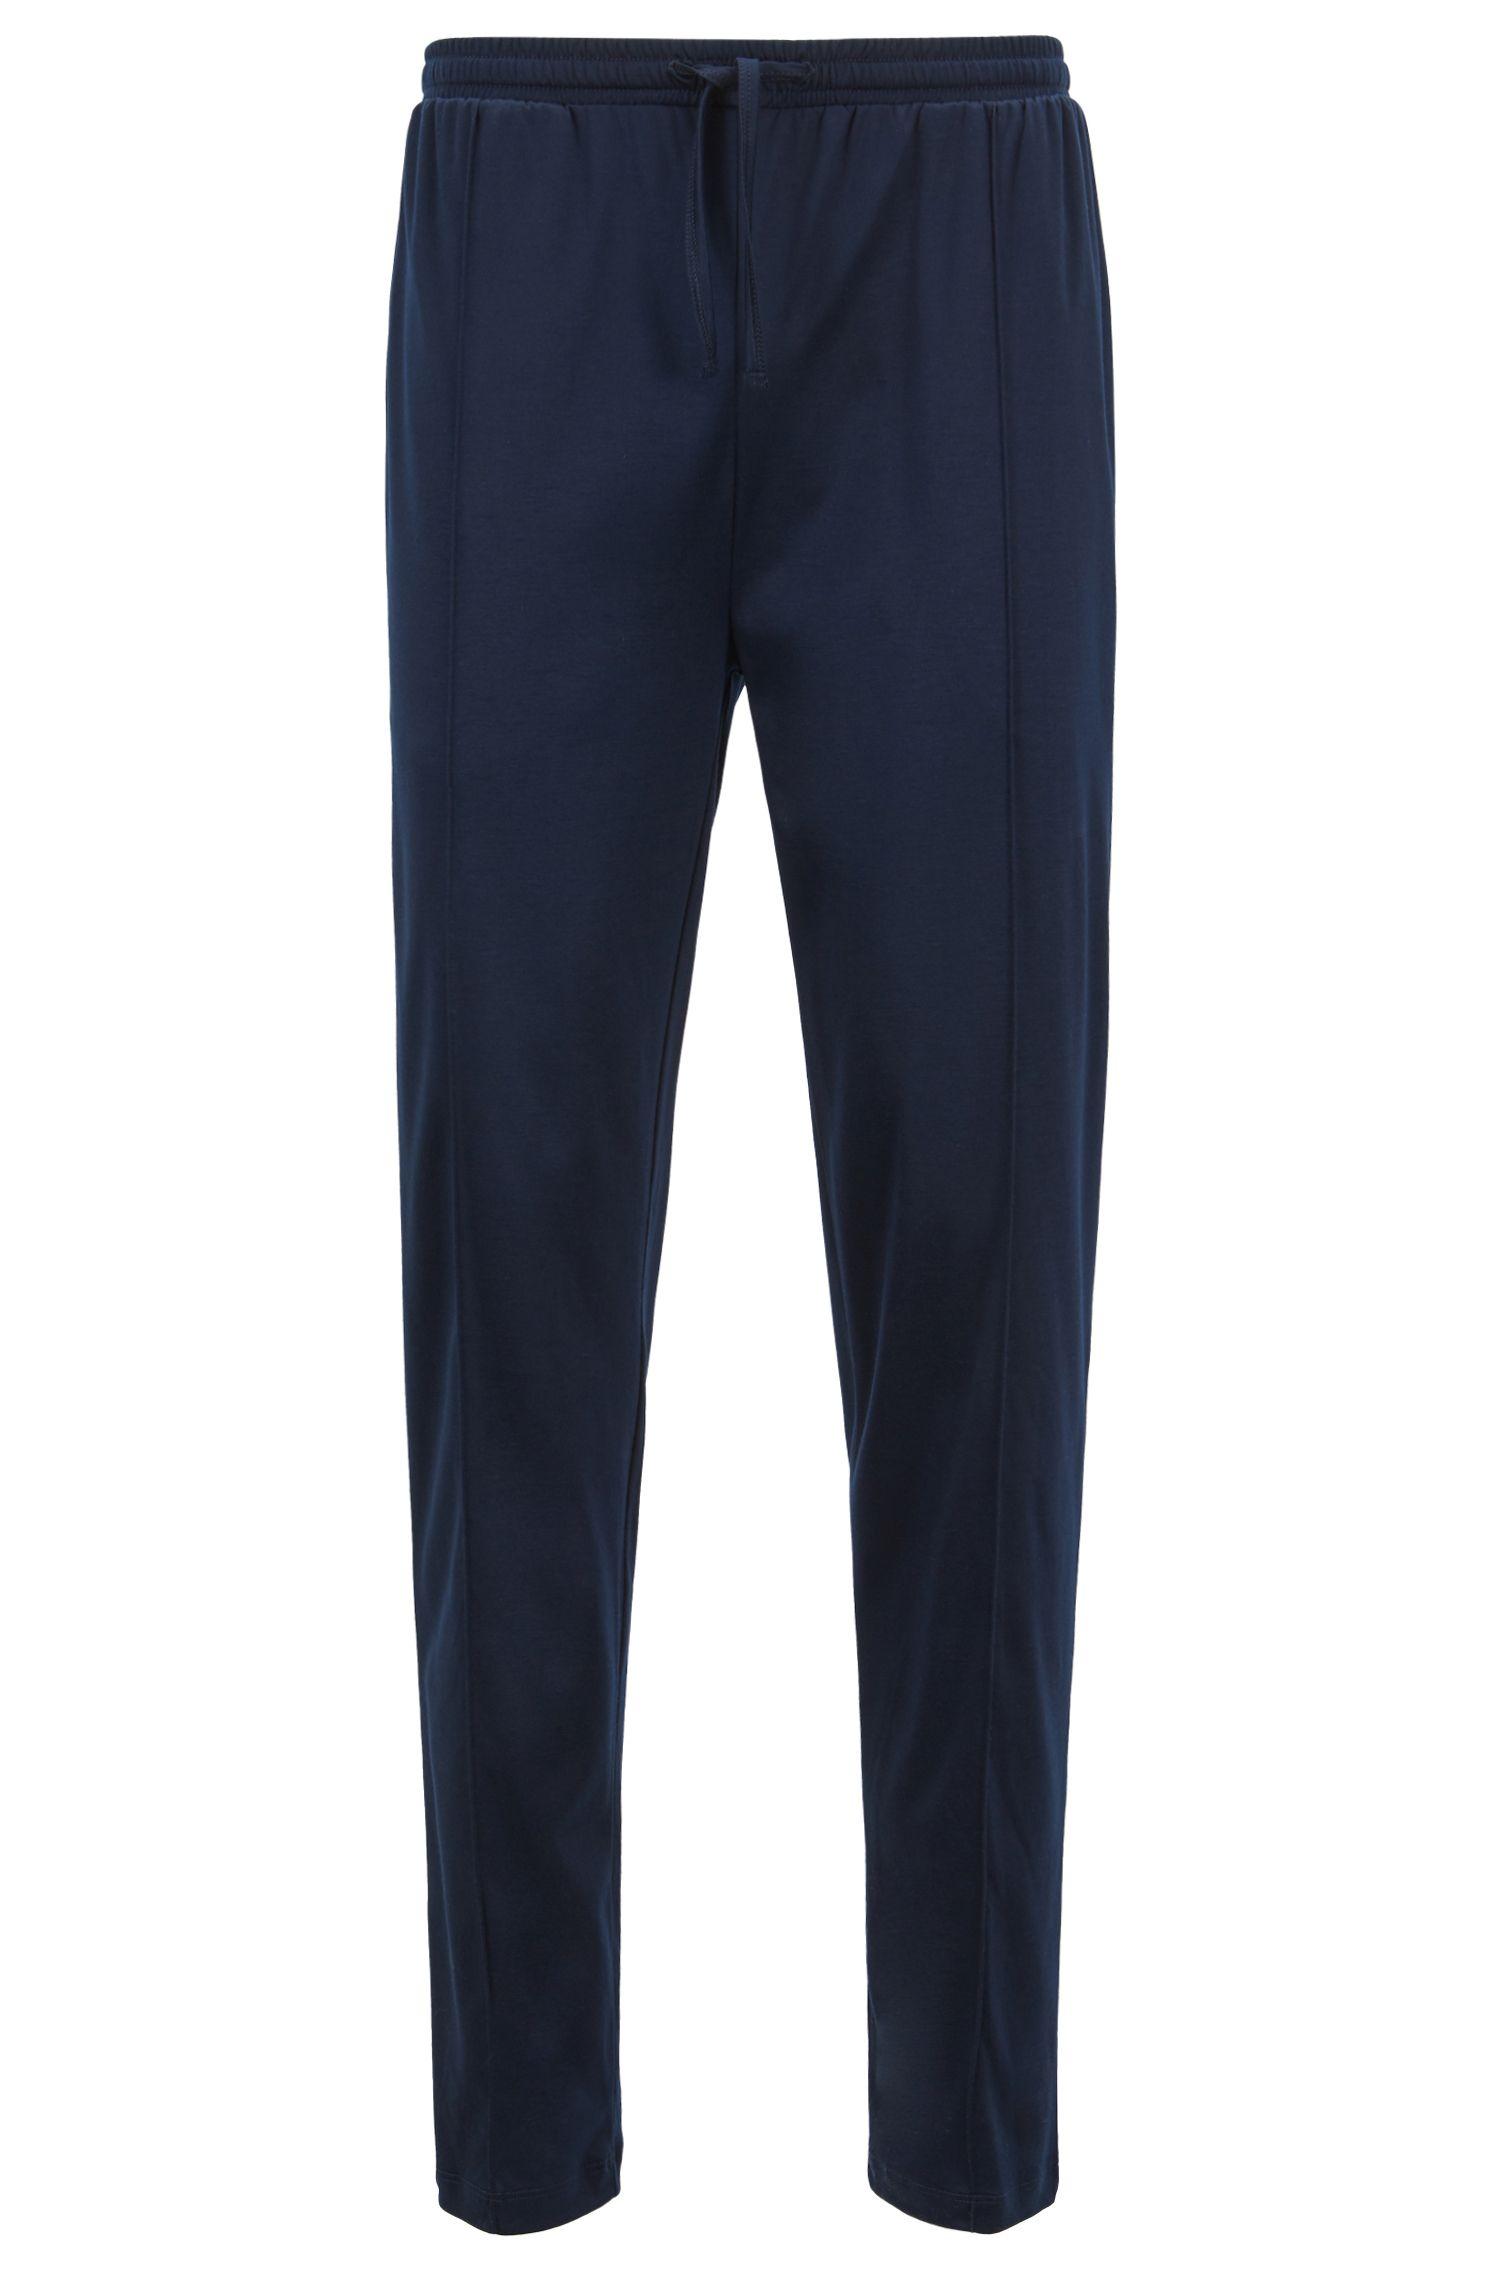 Pantalon de pyjama en coton interlock mélangé à du modal | Tuggl